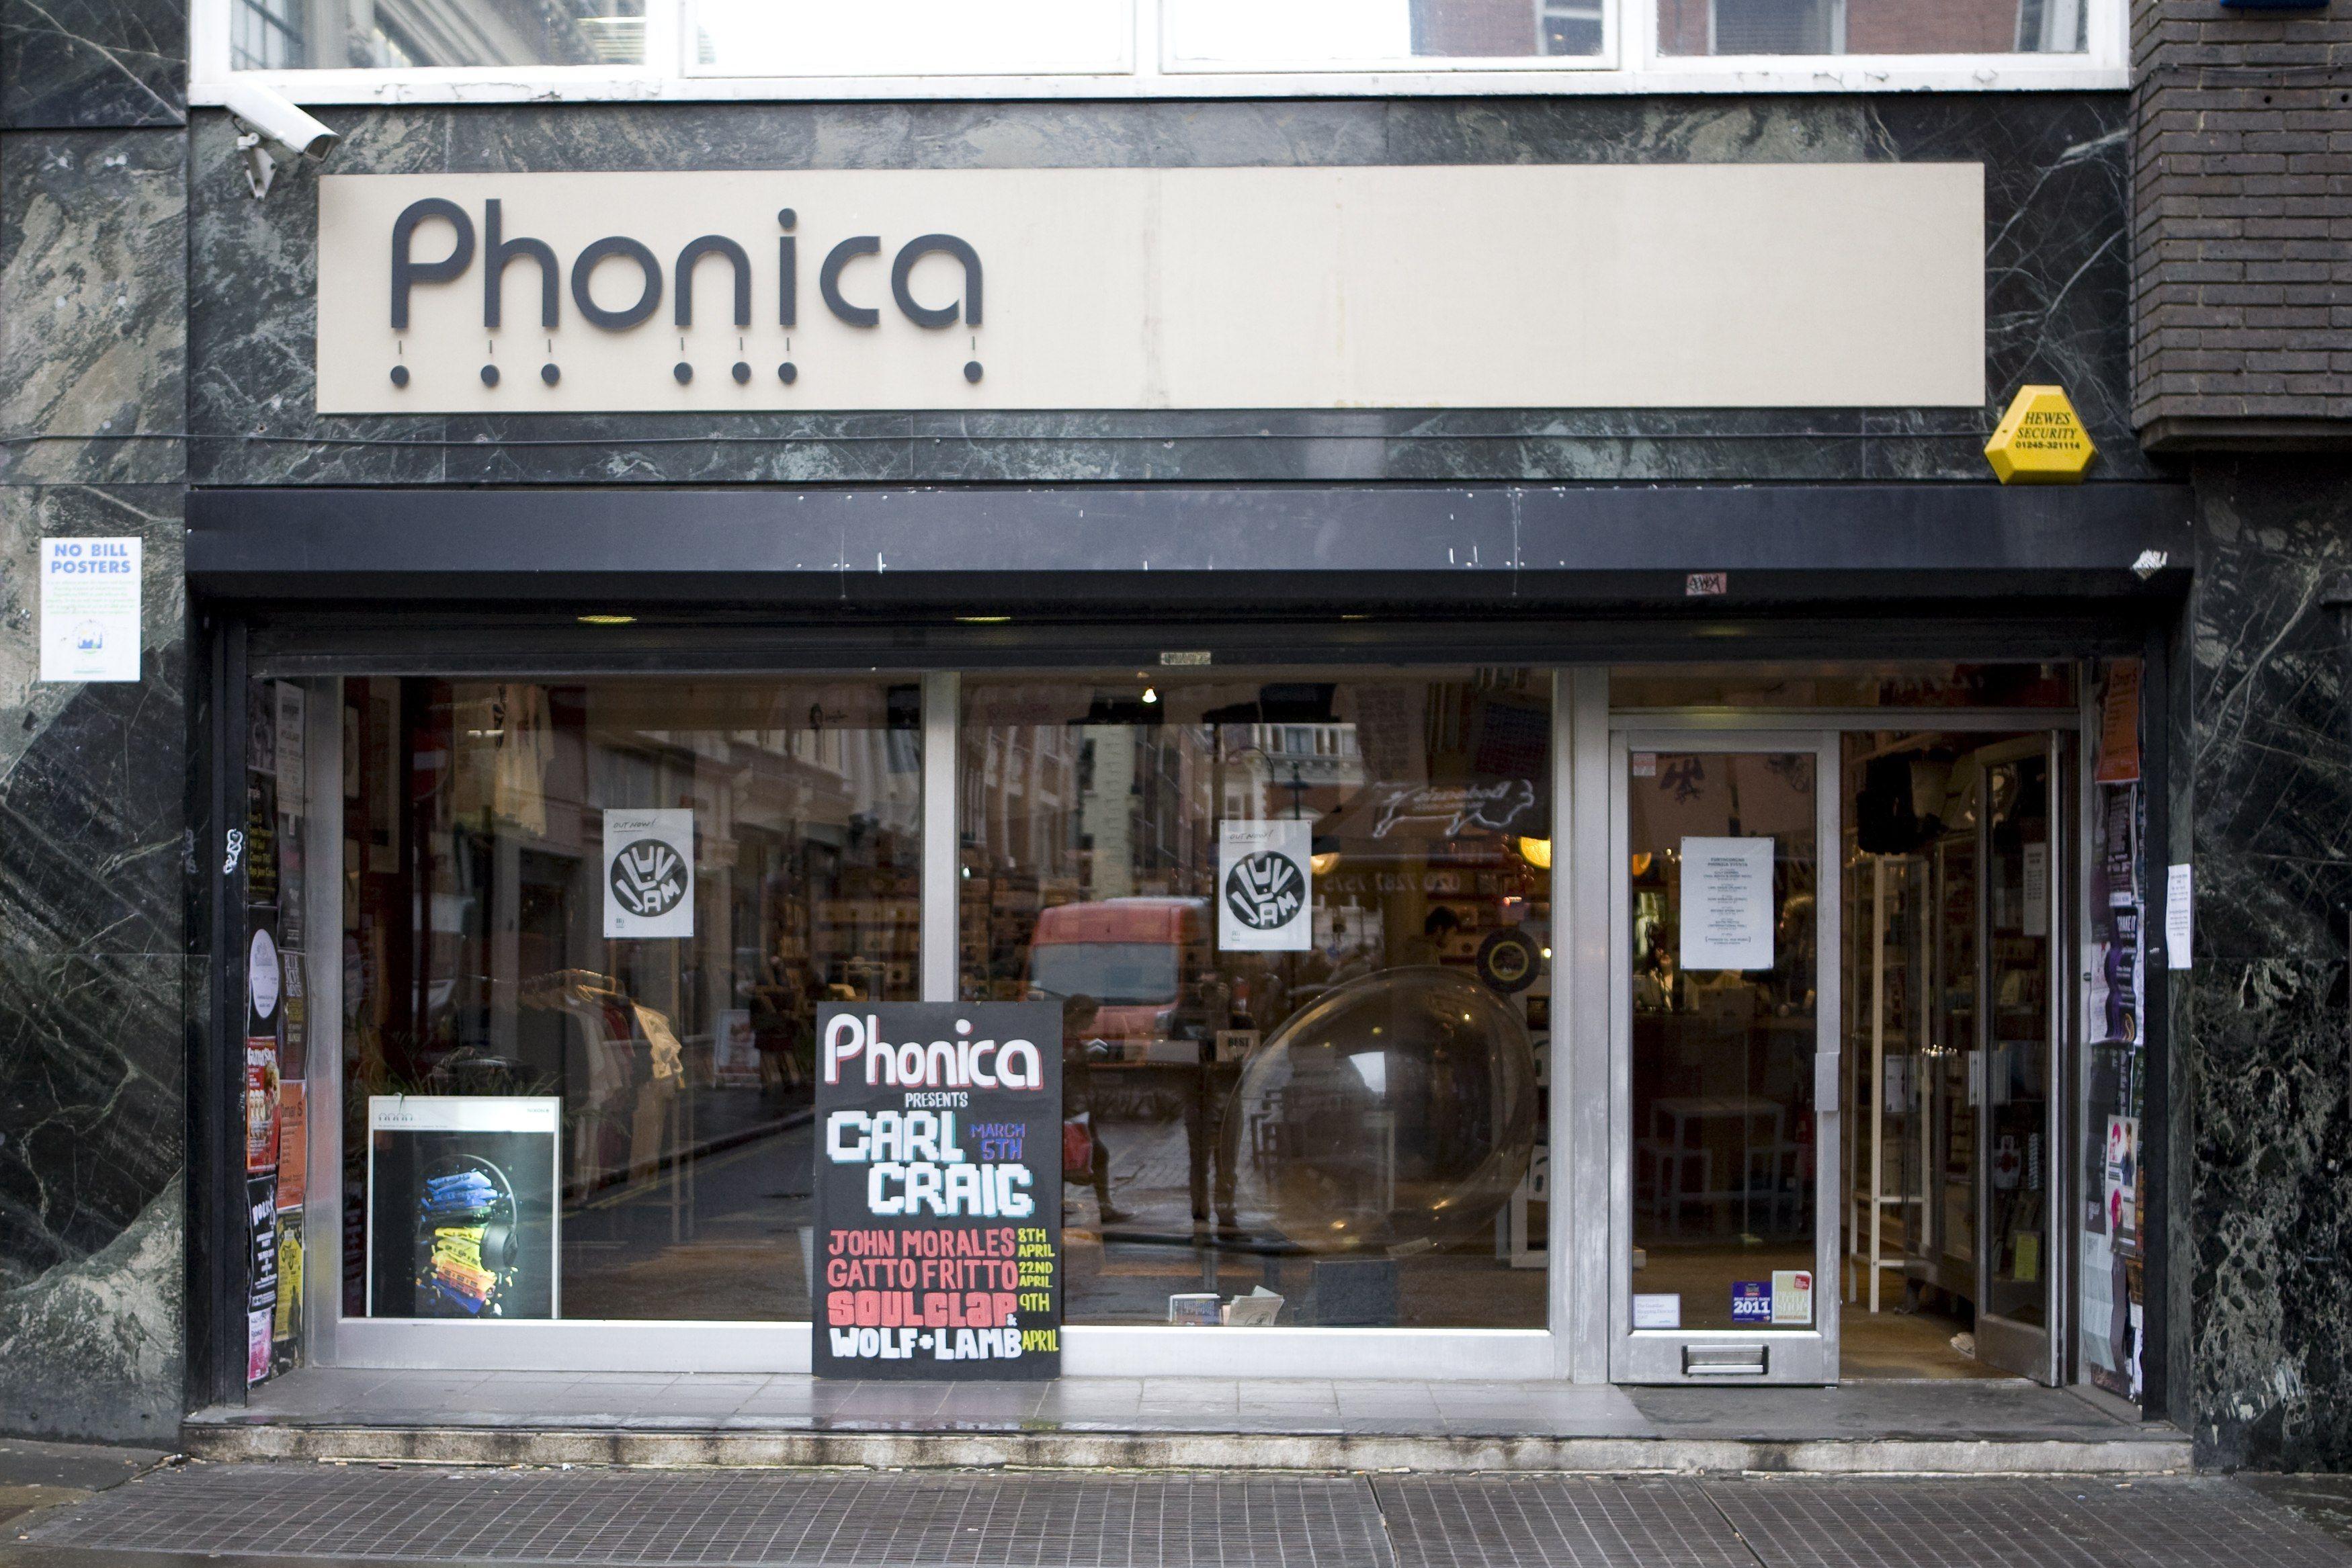 SOCIAL ASSET - phonica2 record store vinilos discos